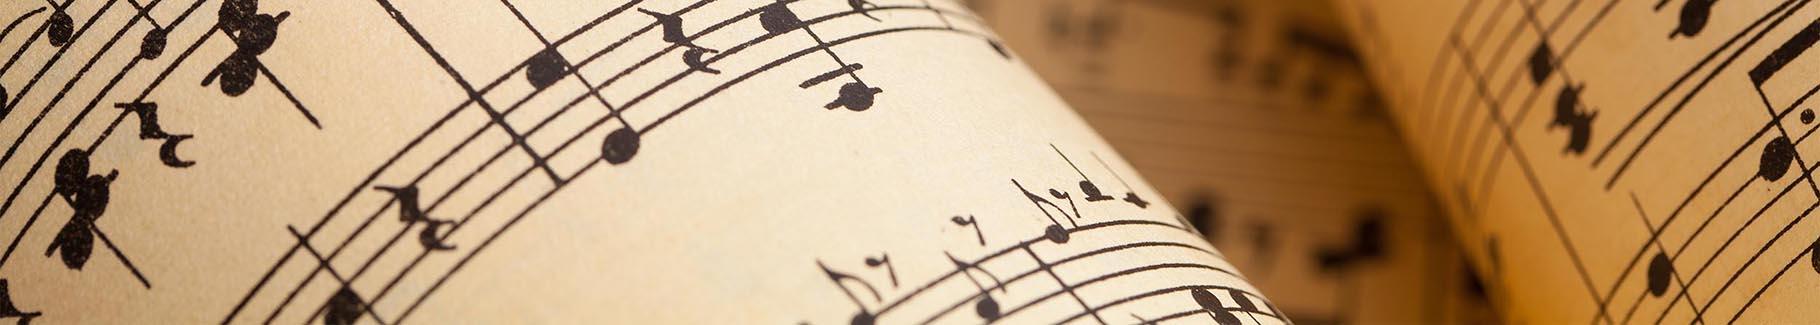 Obraz muzyka na płótnie